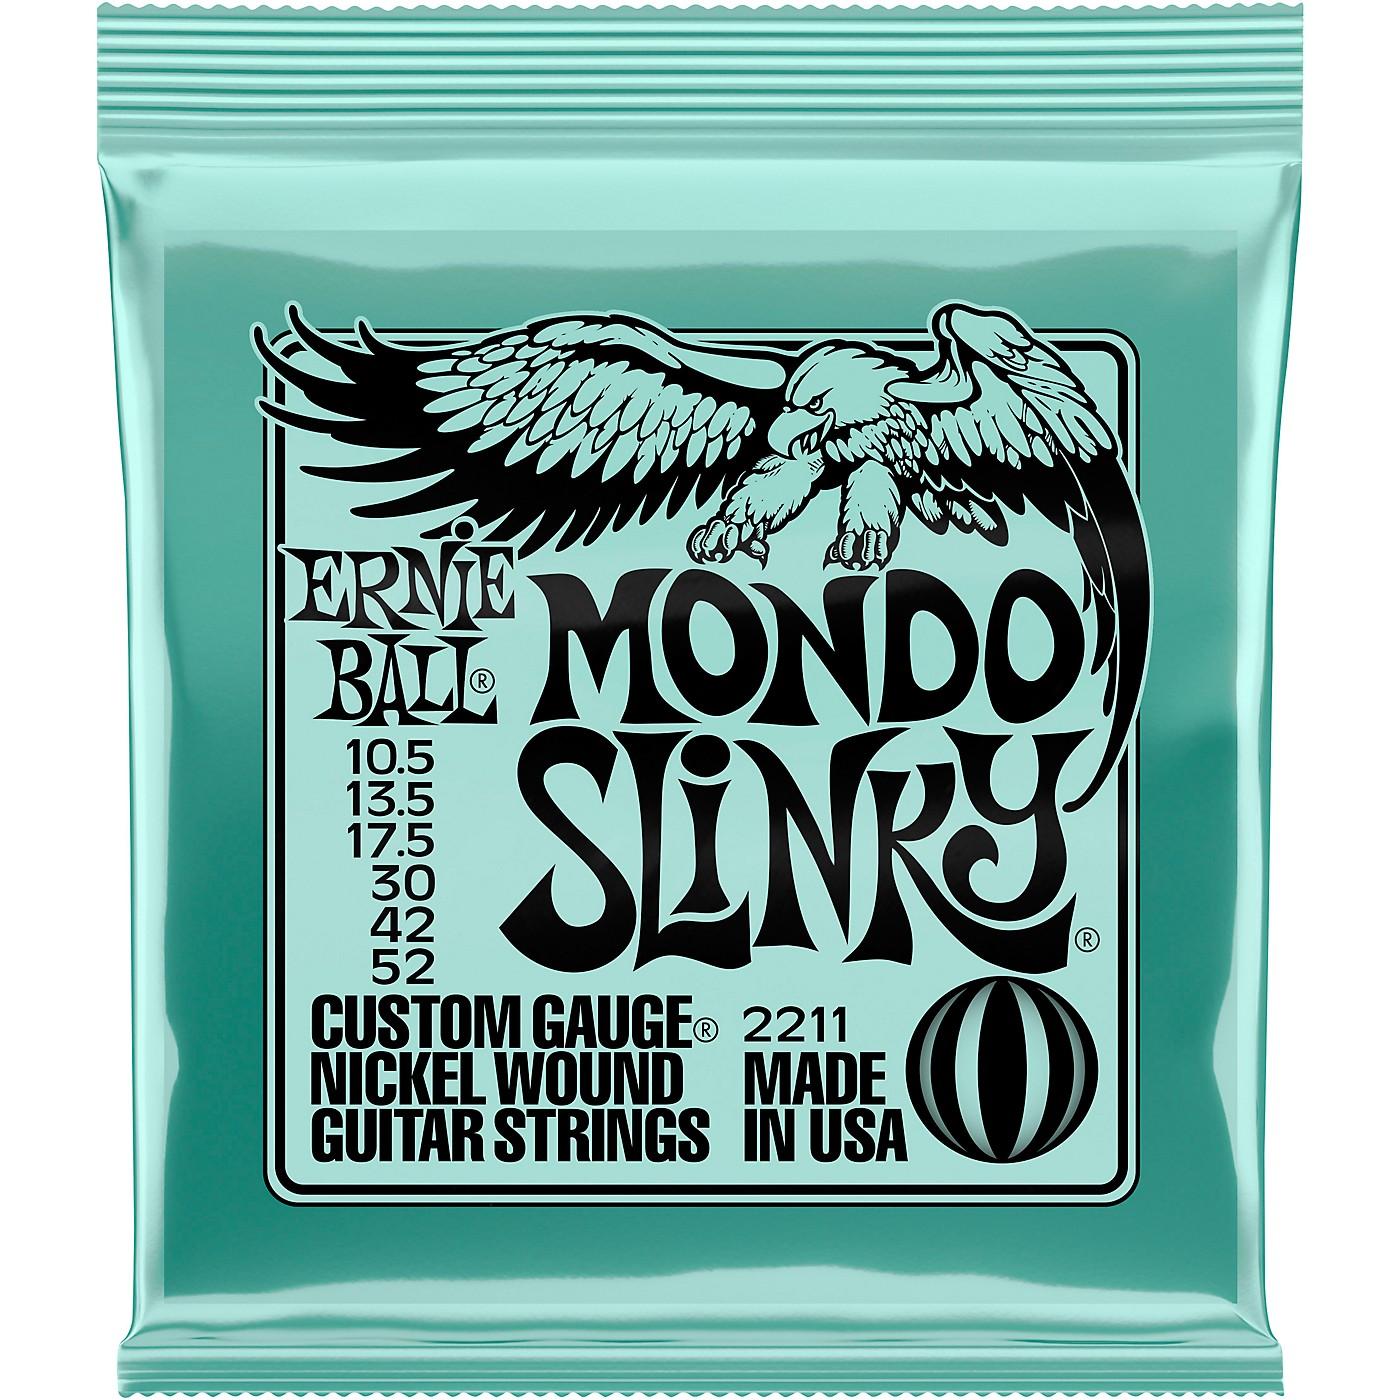 Ernie Ball Mondo Slinky 2211 (10.5-52) Nickel Wound Electric Guitar Strings thumbnail